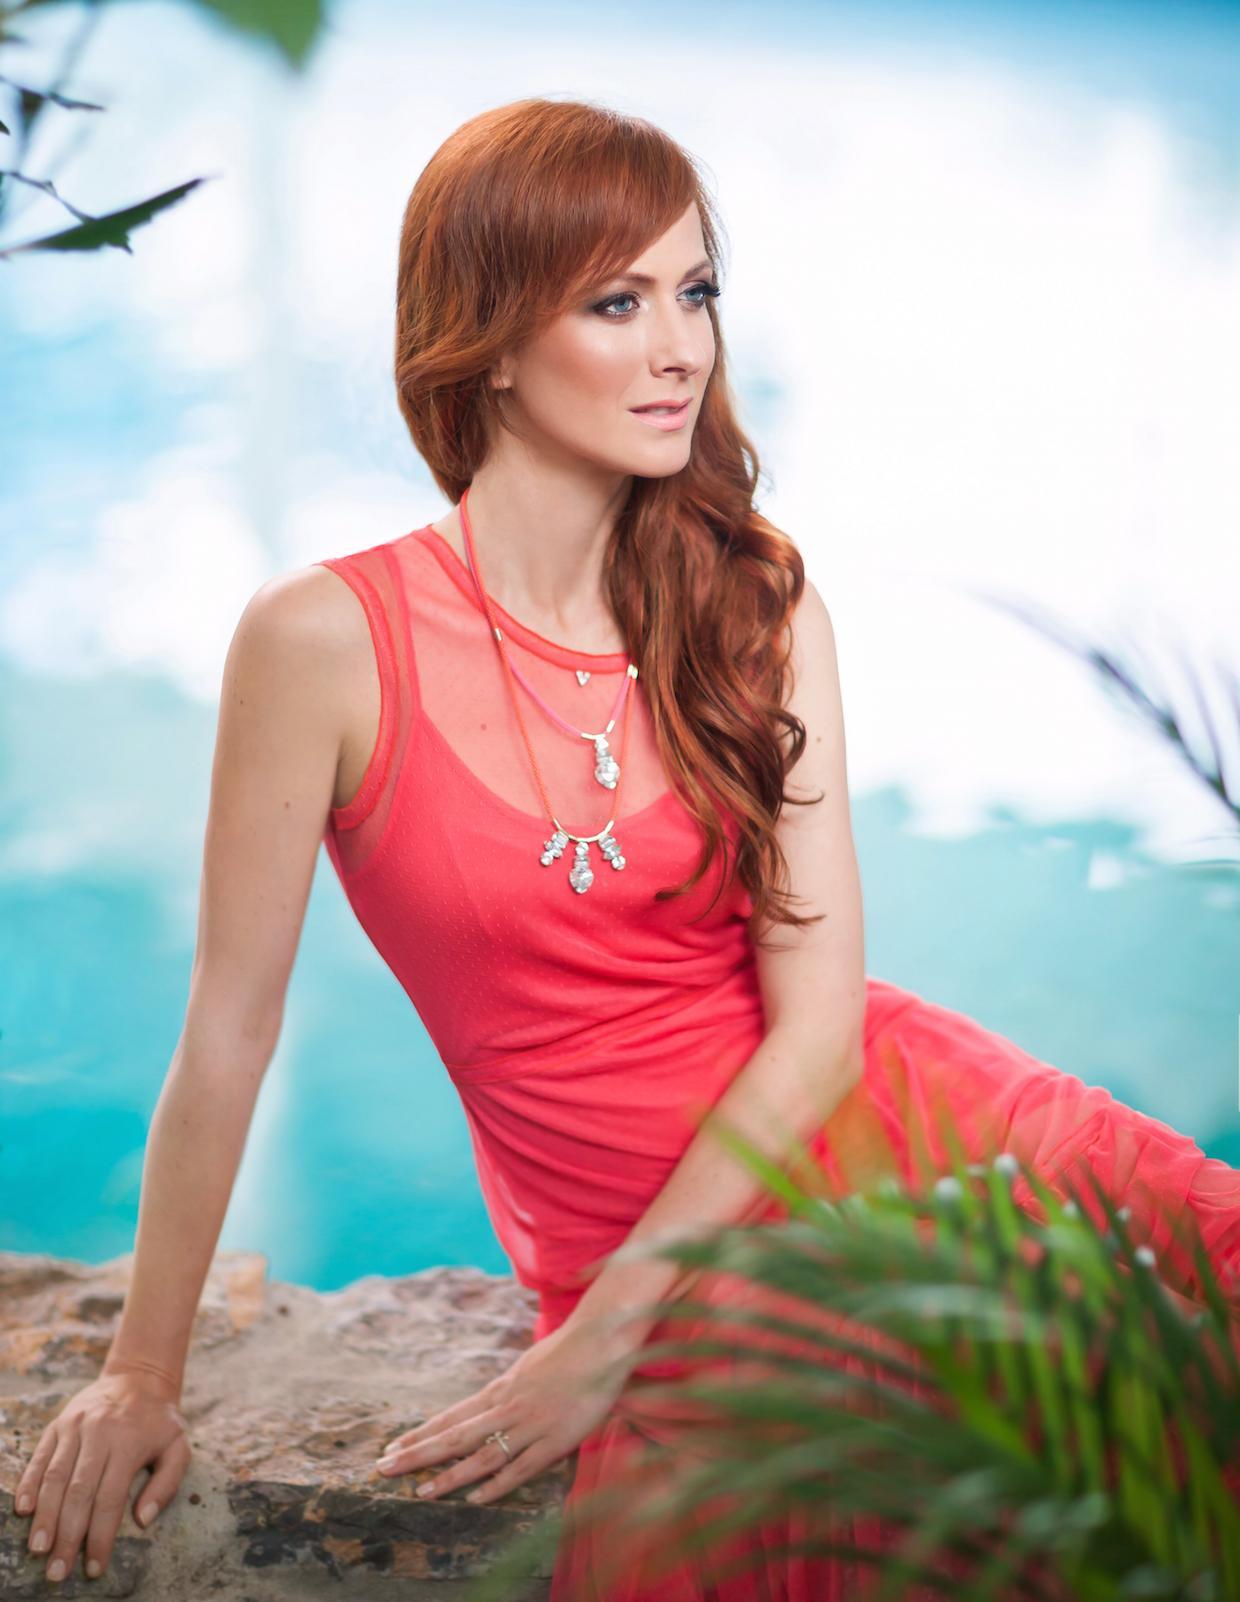 famme-fatale-2015-Nika-Veger-lepotna-blogerkao-Ana-Gregoric 1